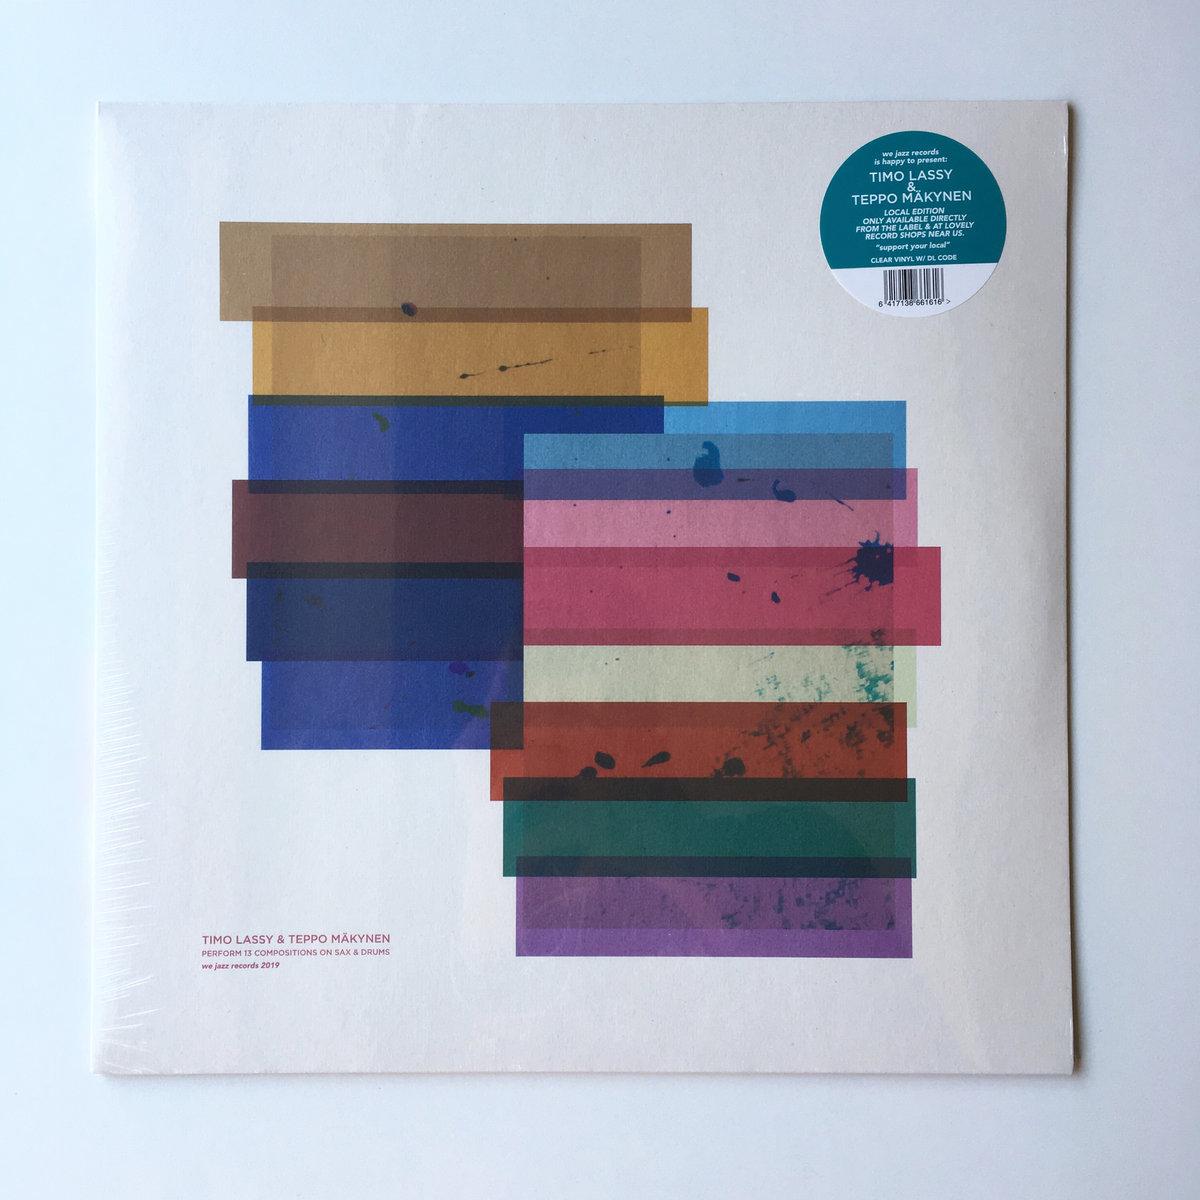 Timo Lassy & Teppo Mäkynen | We Jazz Records